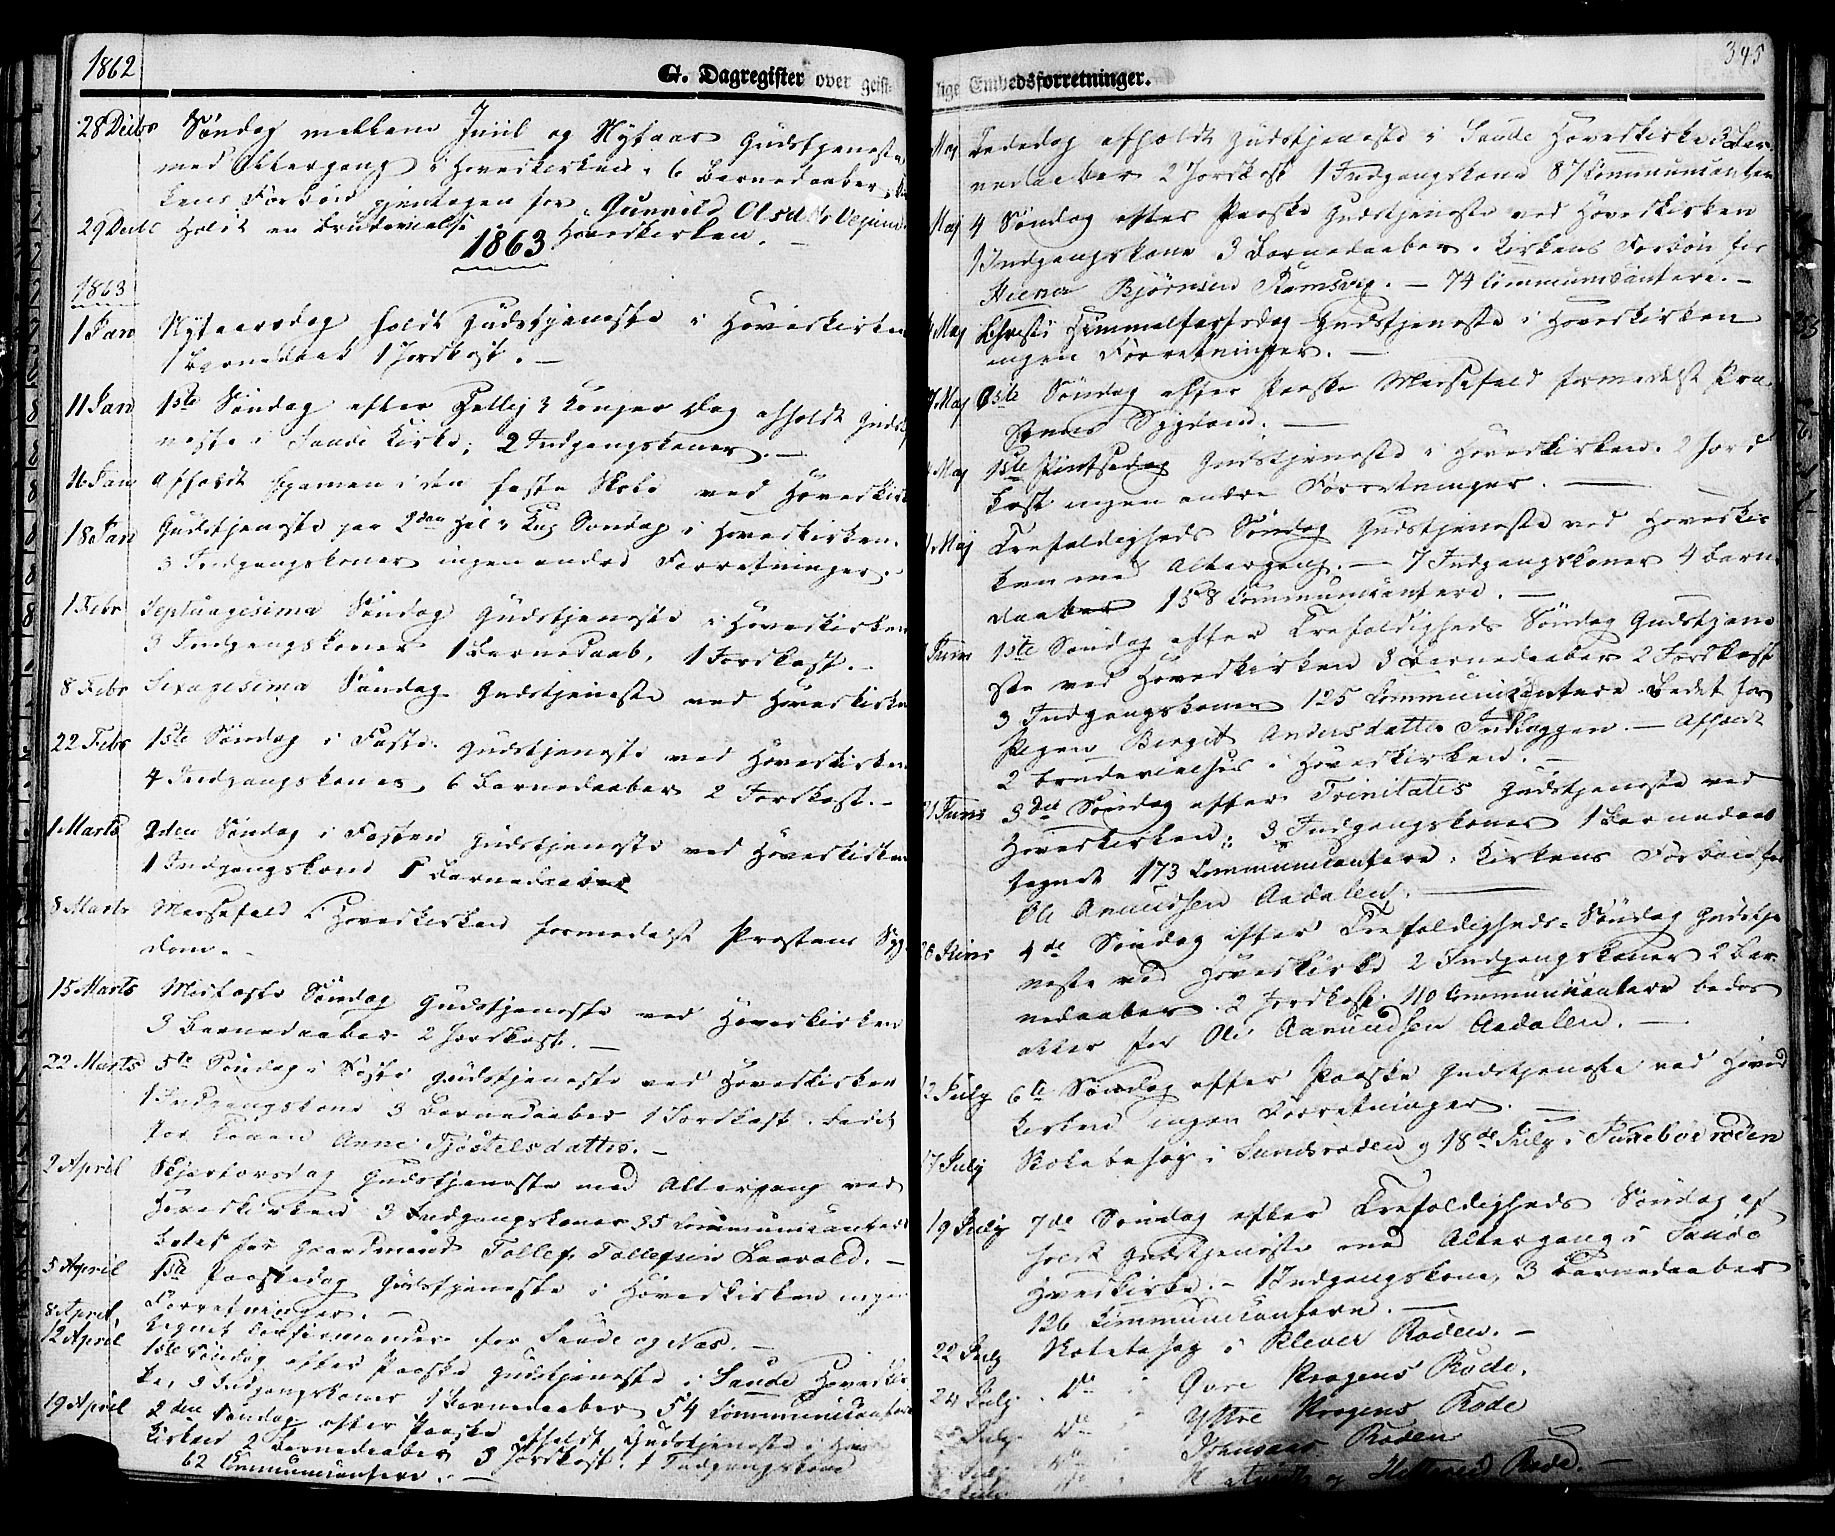 SAKO, Sauherad kirkebøker, F/Fa/L0007: Ministerialbok nr. I 7, 1851-1873, s. 345